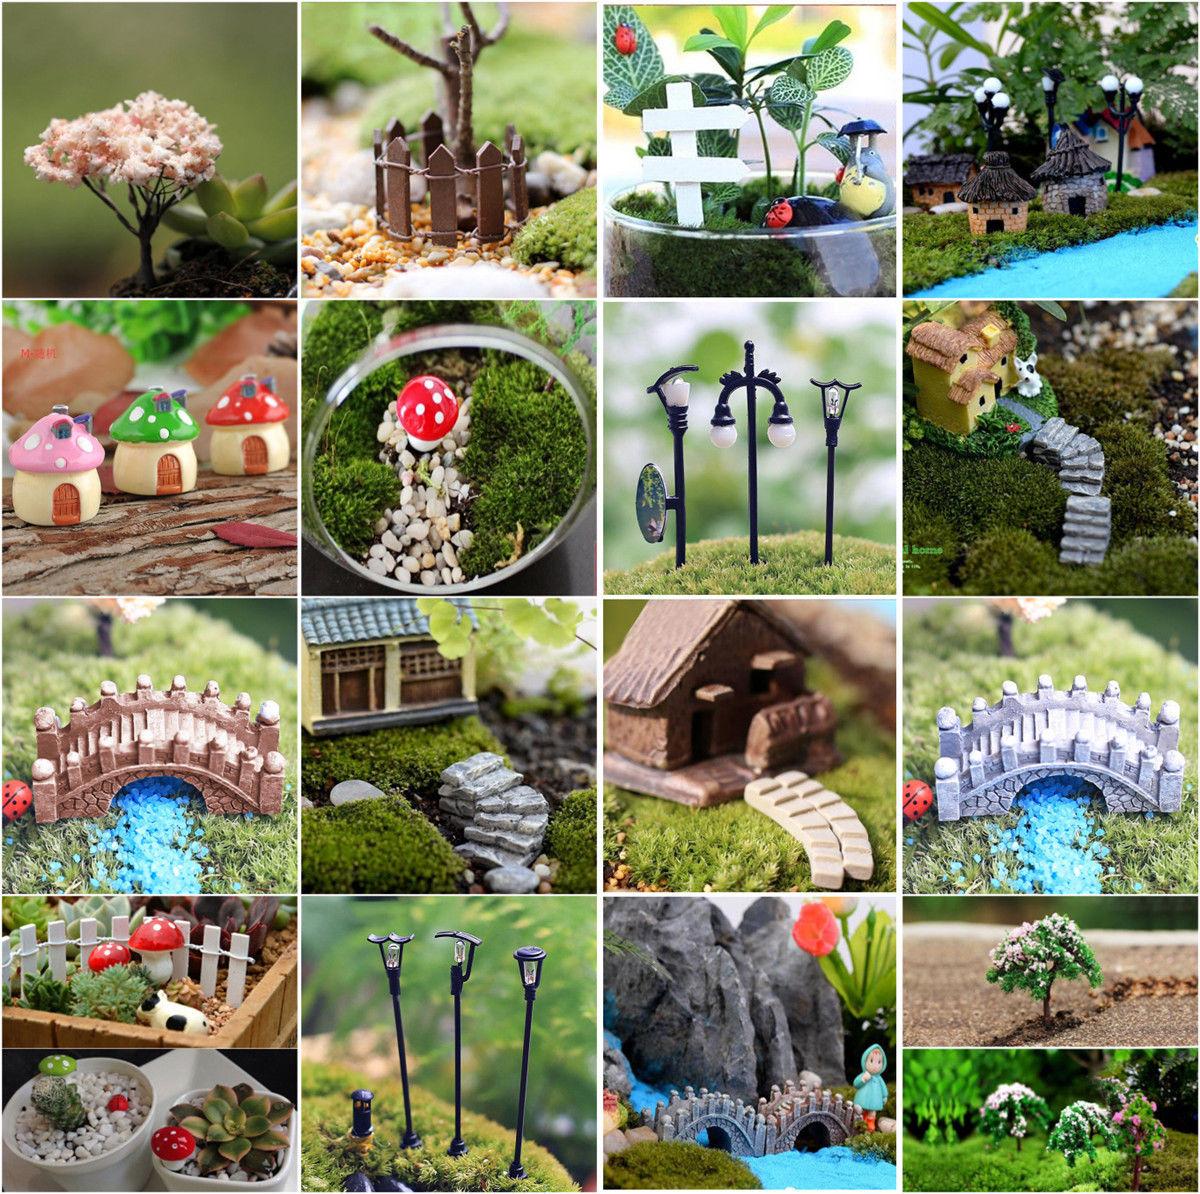 Miniature Round Wood Fence Barrier Craft Garden Decor Ornament Plant Pot Micro Landscape Bonsai DIY Dollhouse Fairy Mini Landscape Edging Picket Fence Border for Garden Outdoor Home Decor 2Pcs Brown